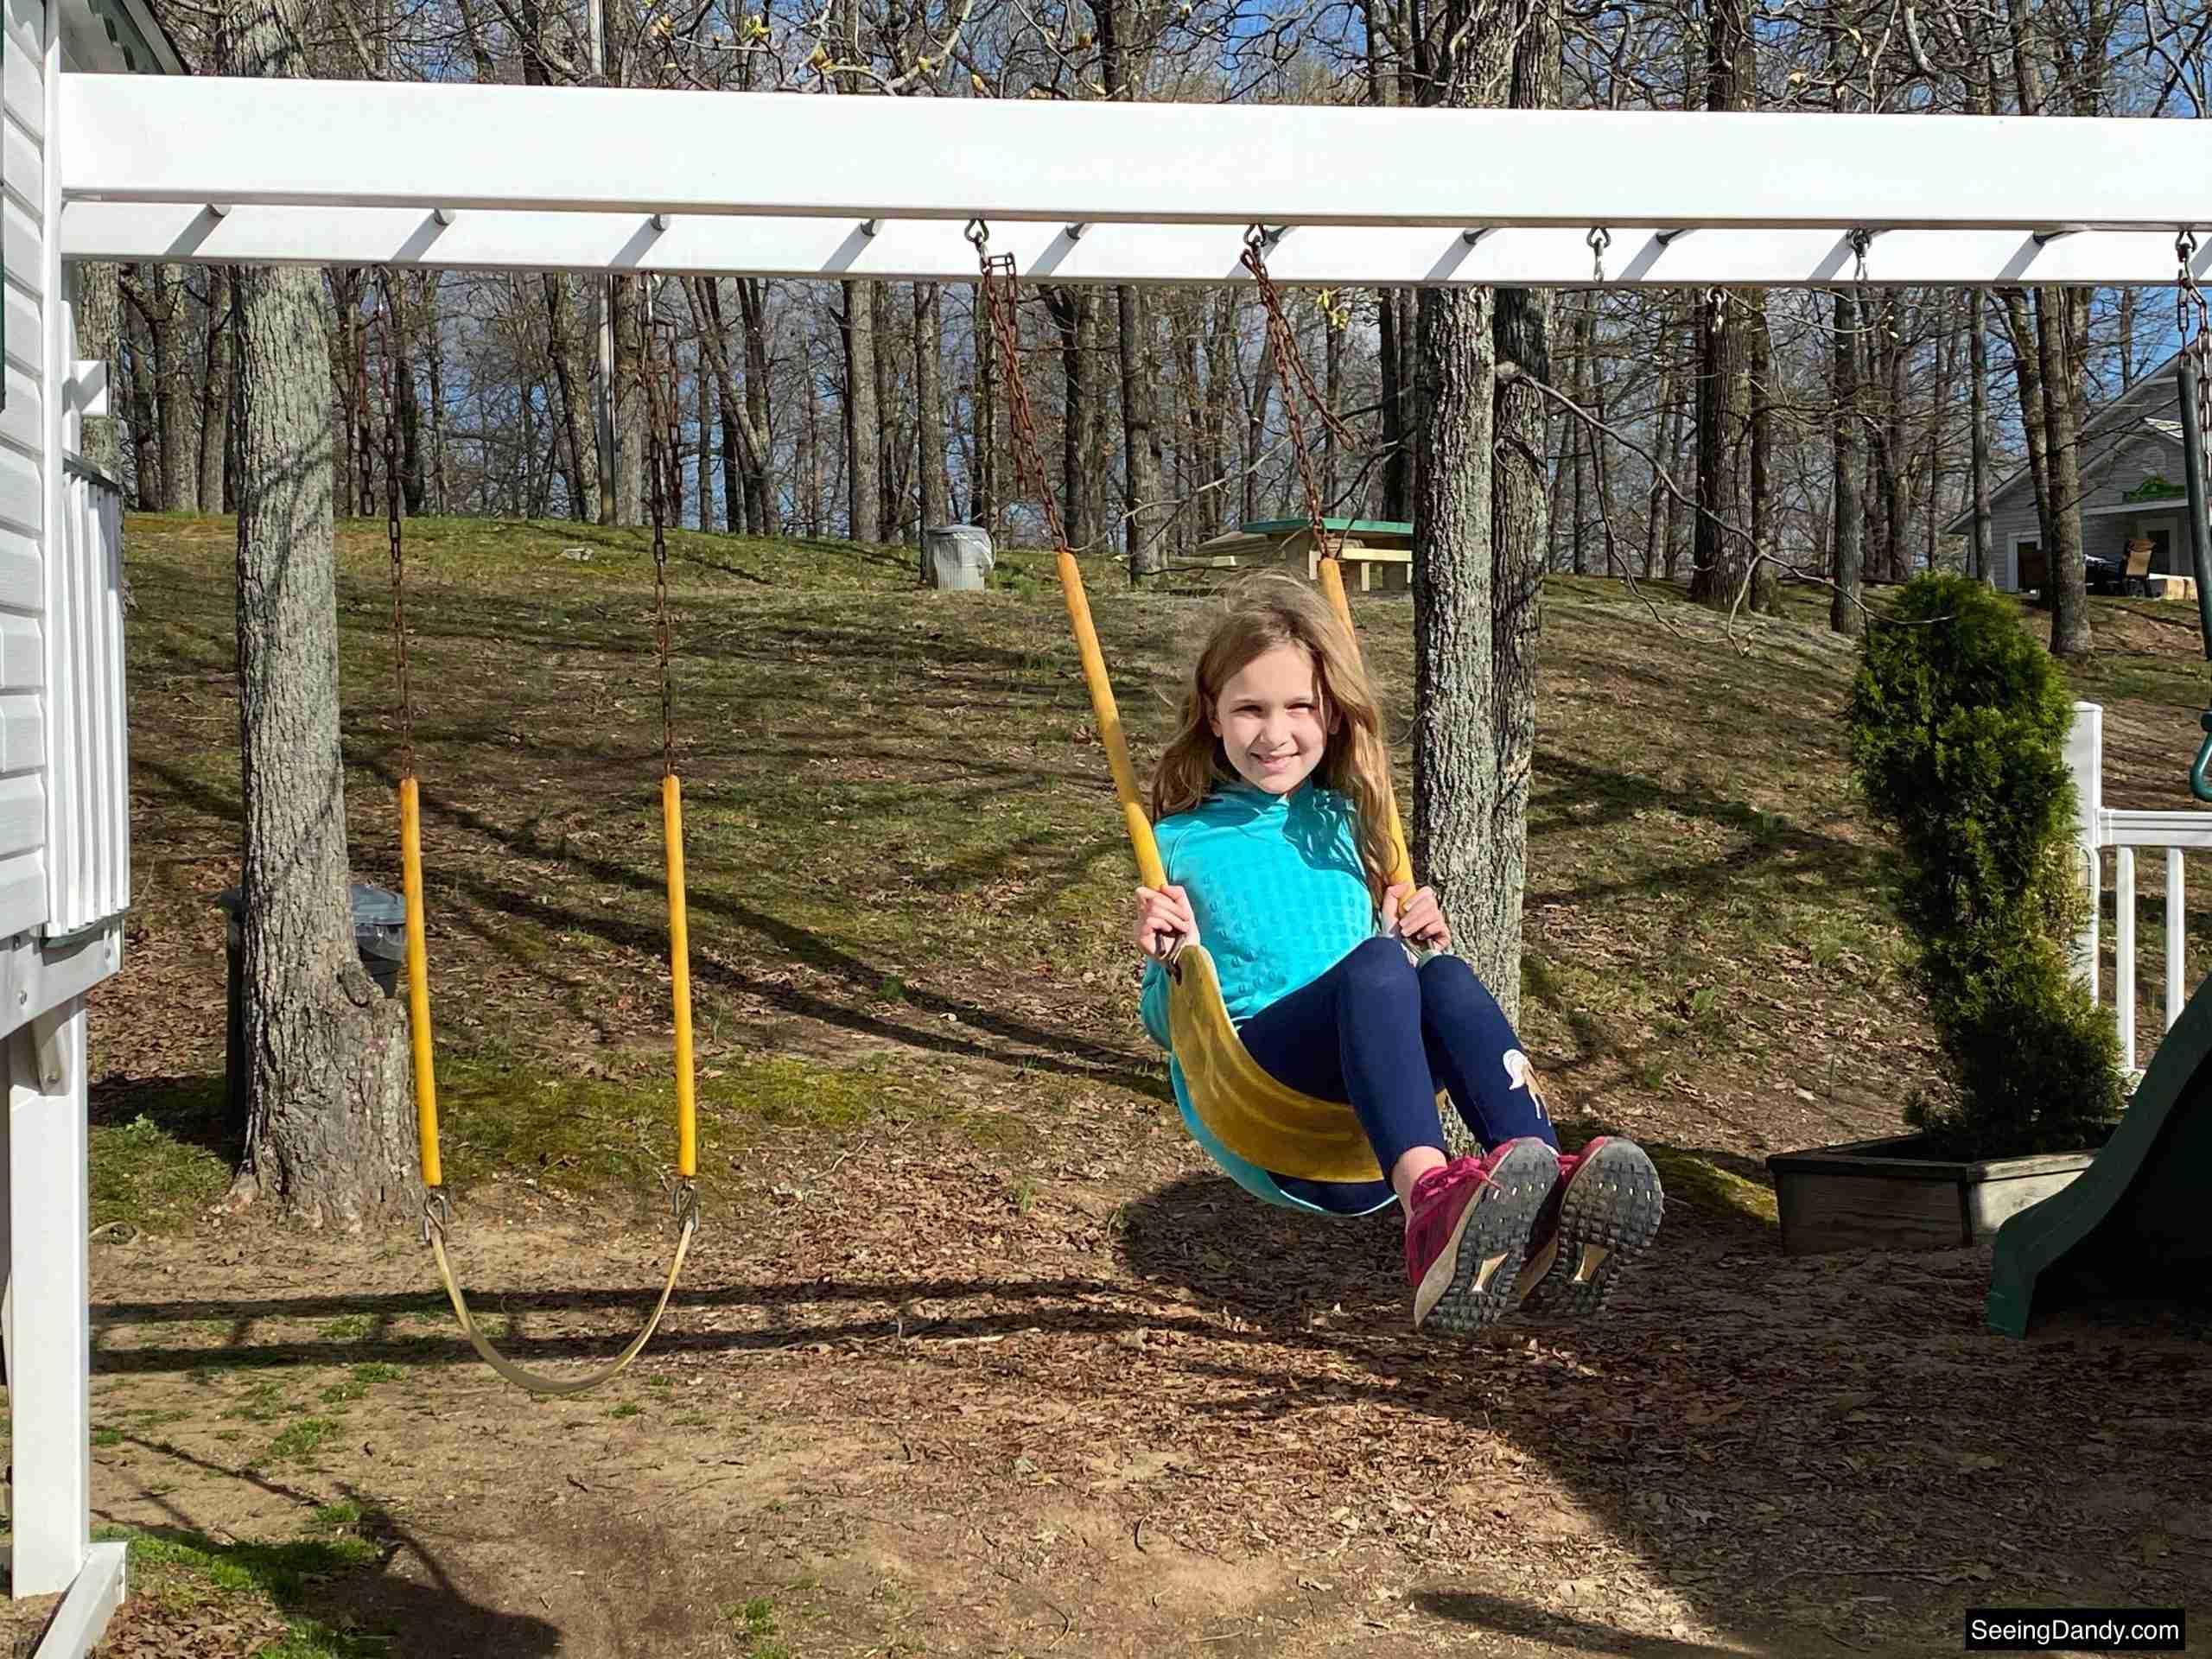 green turtle bay playground, playhouse swings, playhouse monkey bars, white playhouse, grand rivers kentucky playground, kids playhouse, family travel, lake barkley playground